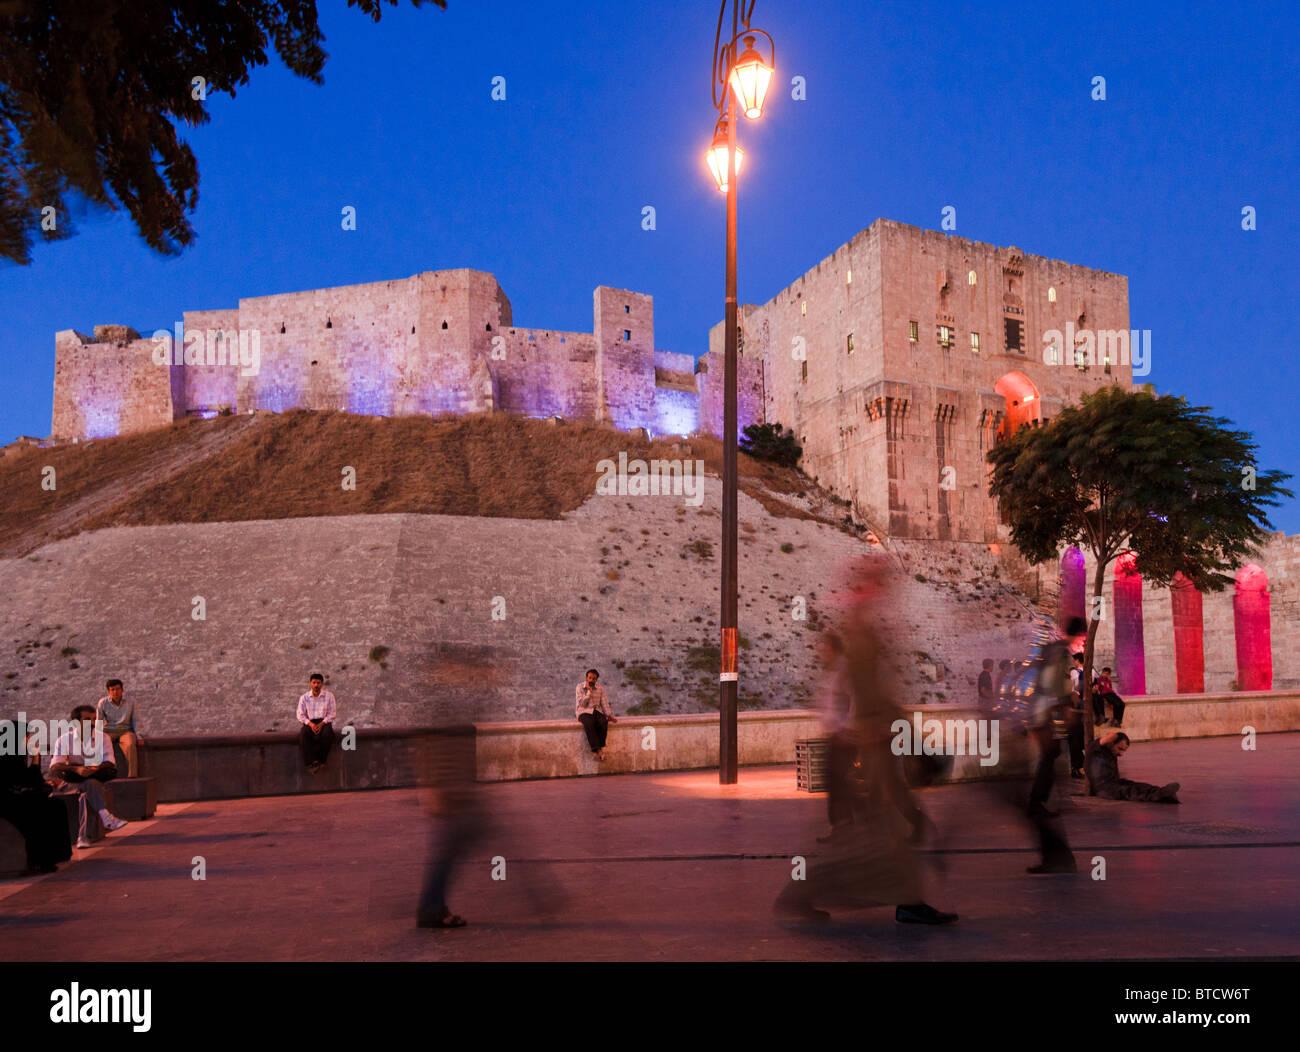 The citadel ( castle ) of Aleppo, Syria Stock Photo